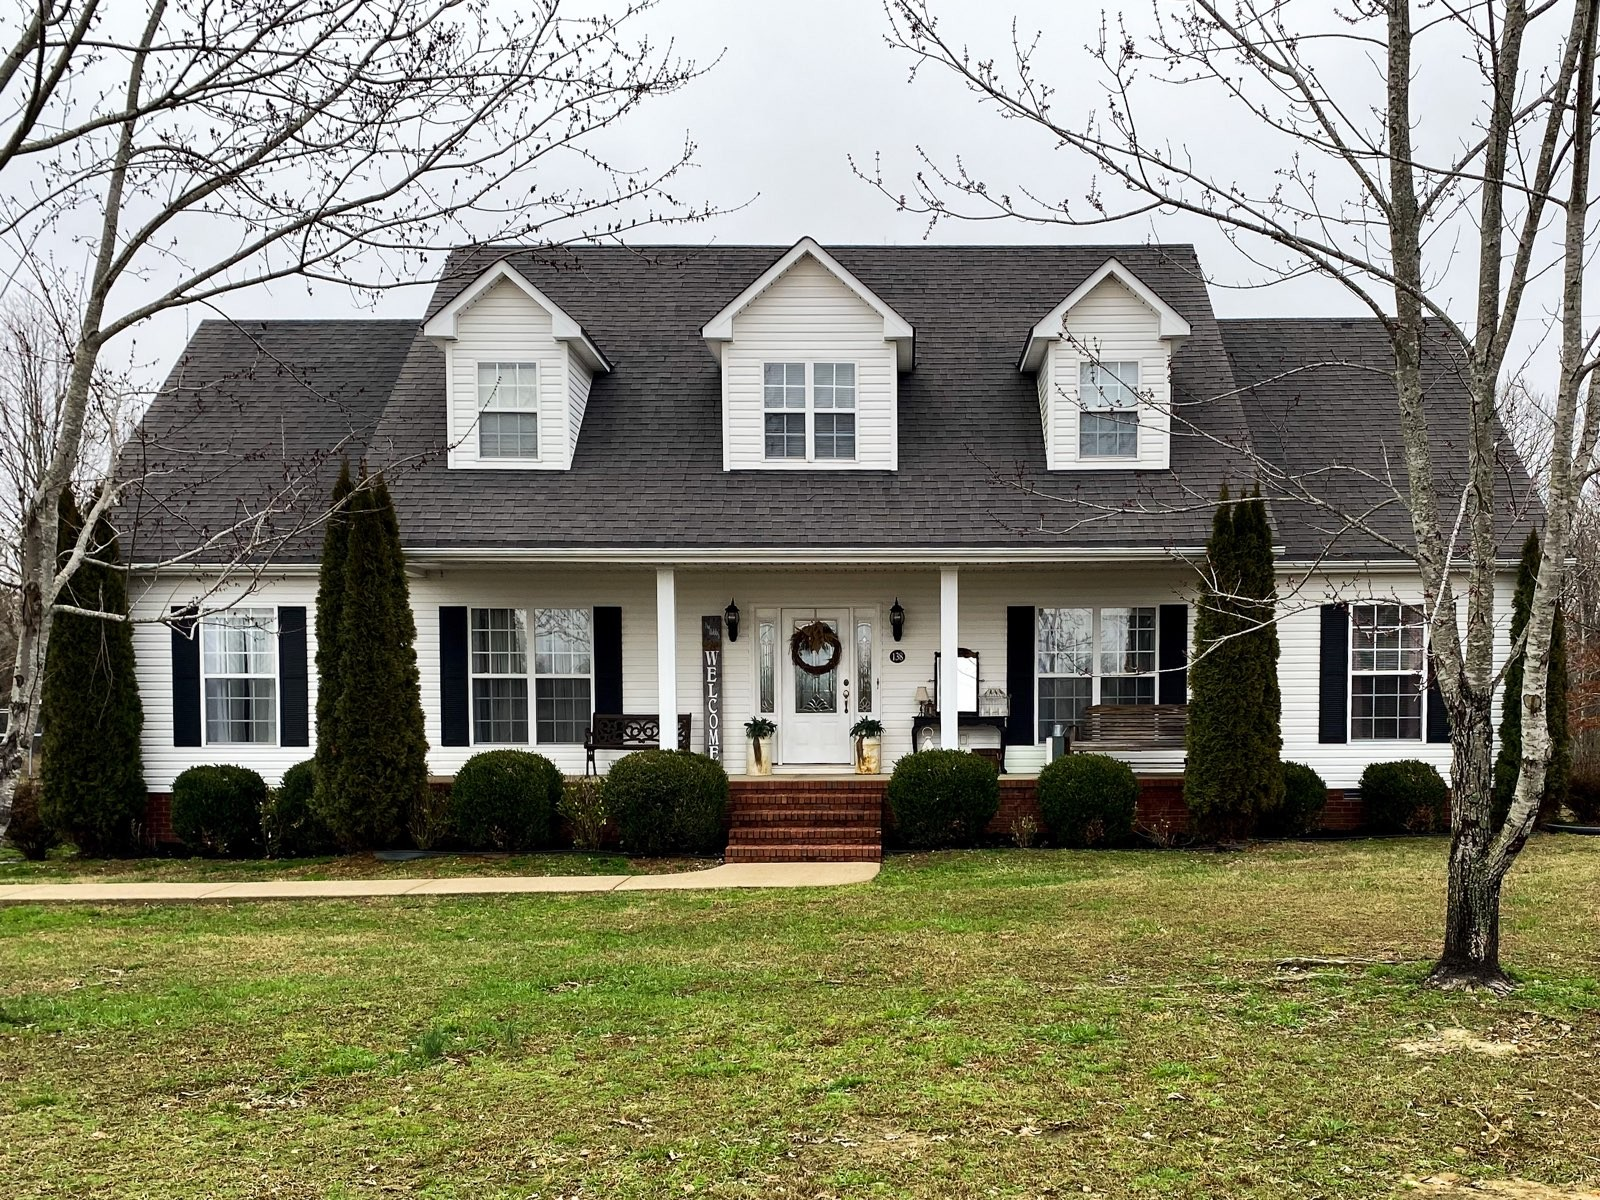 138 Commanche Dr, Hohenwald, TN 38462 - Hohenwald, TN real estate listing